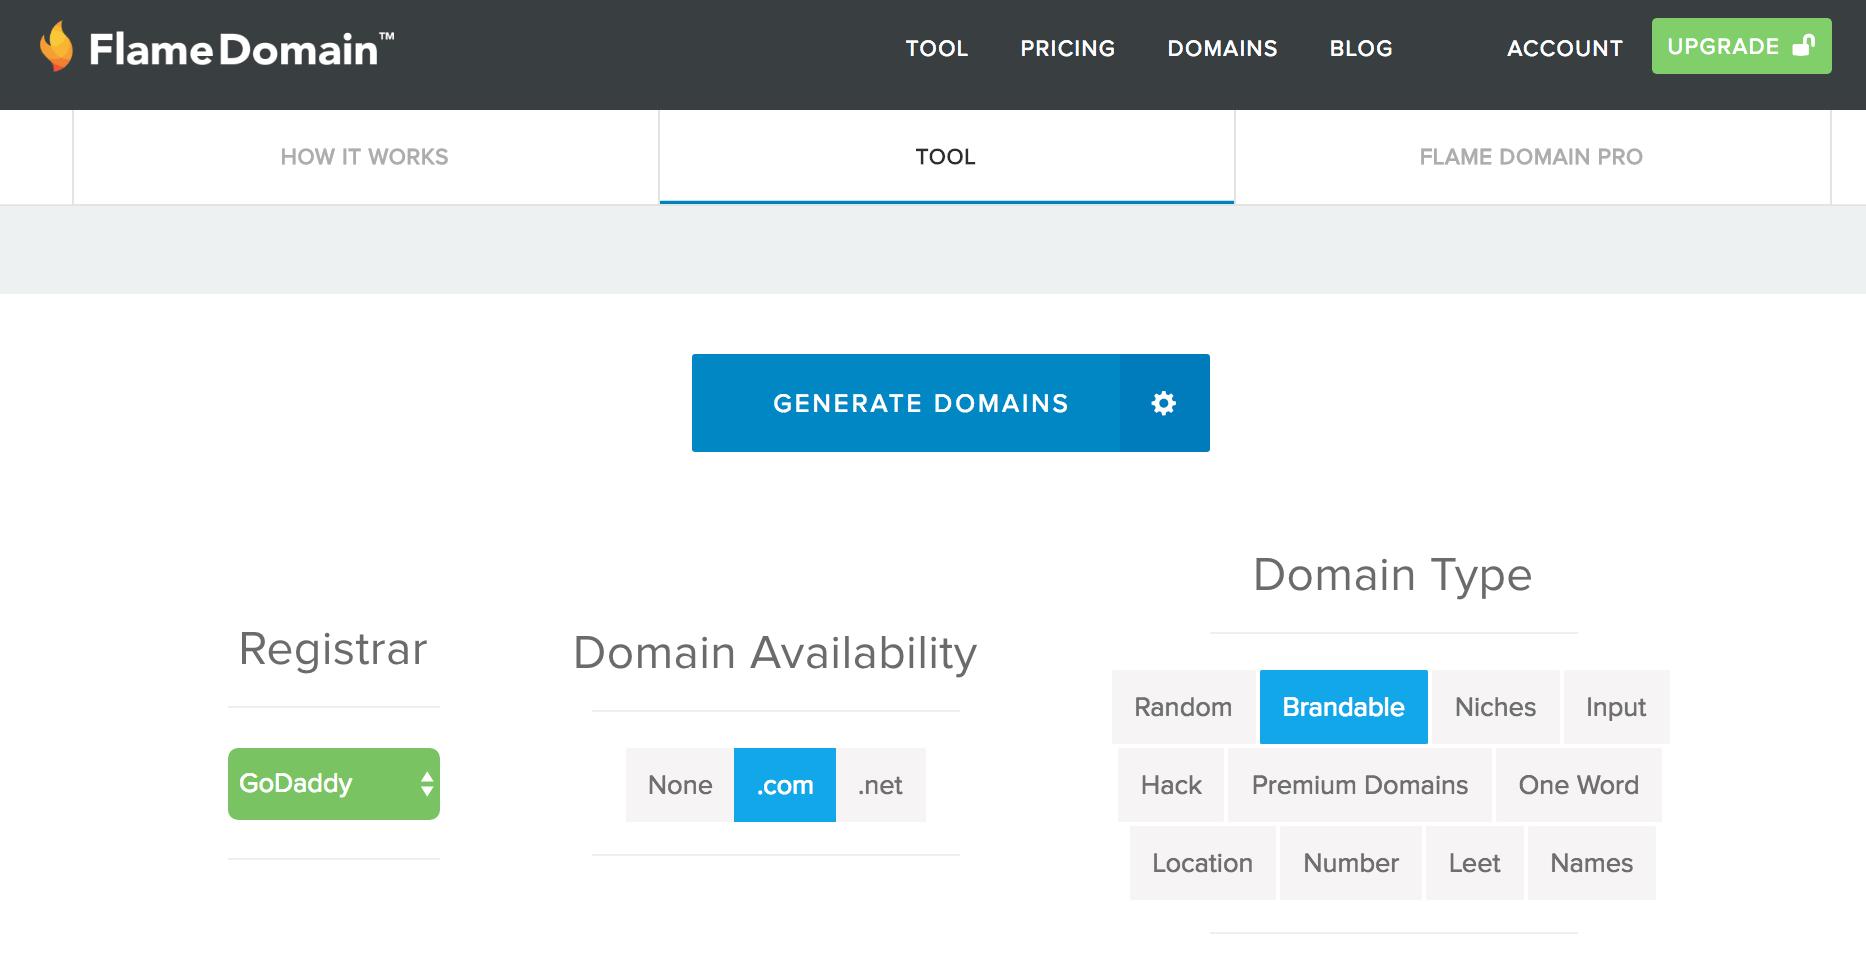 FlameDomain Brand name generator - BlogTipsTricks